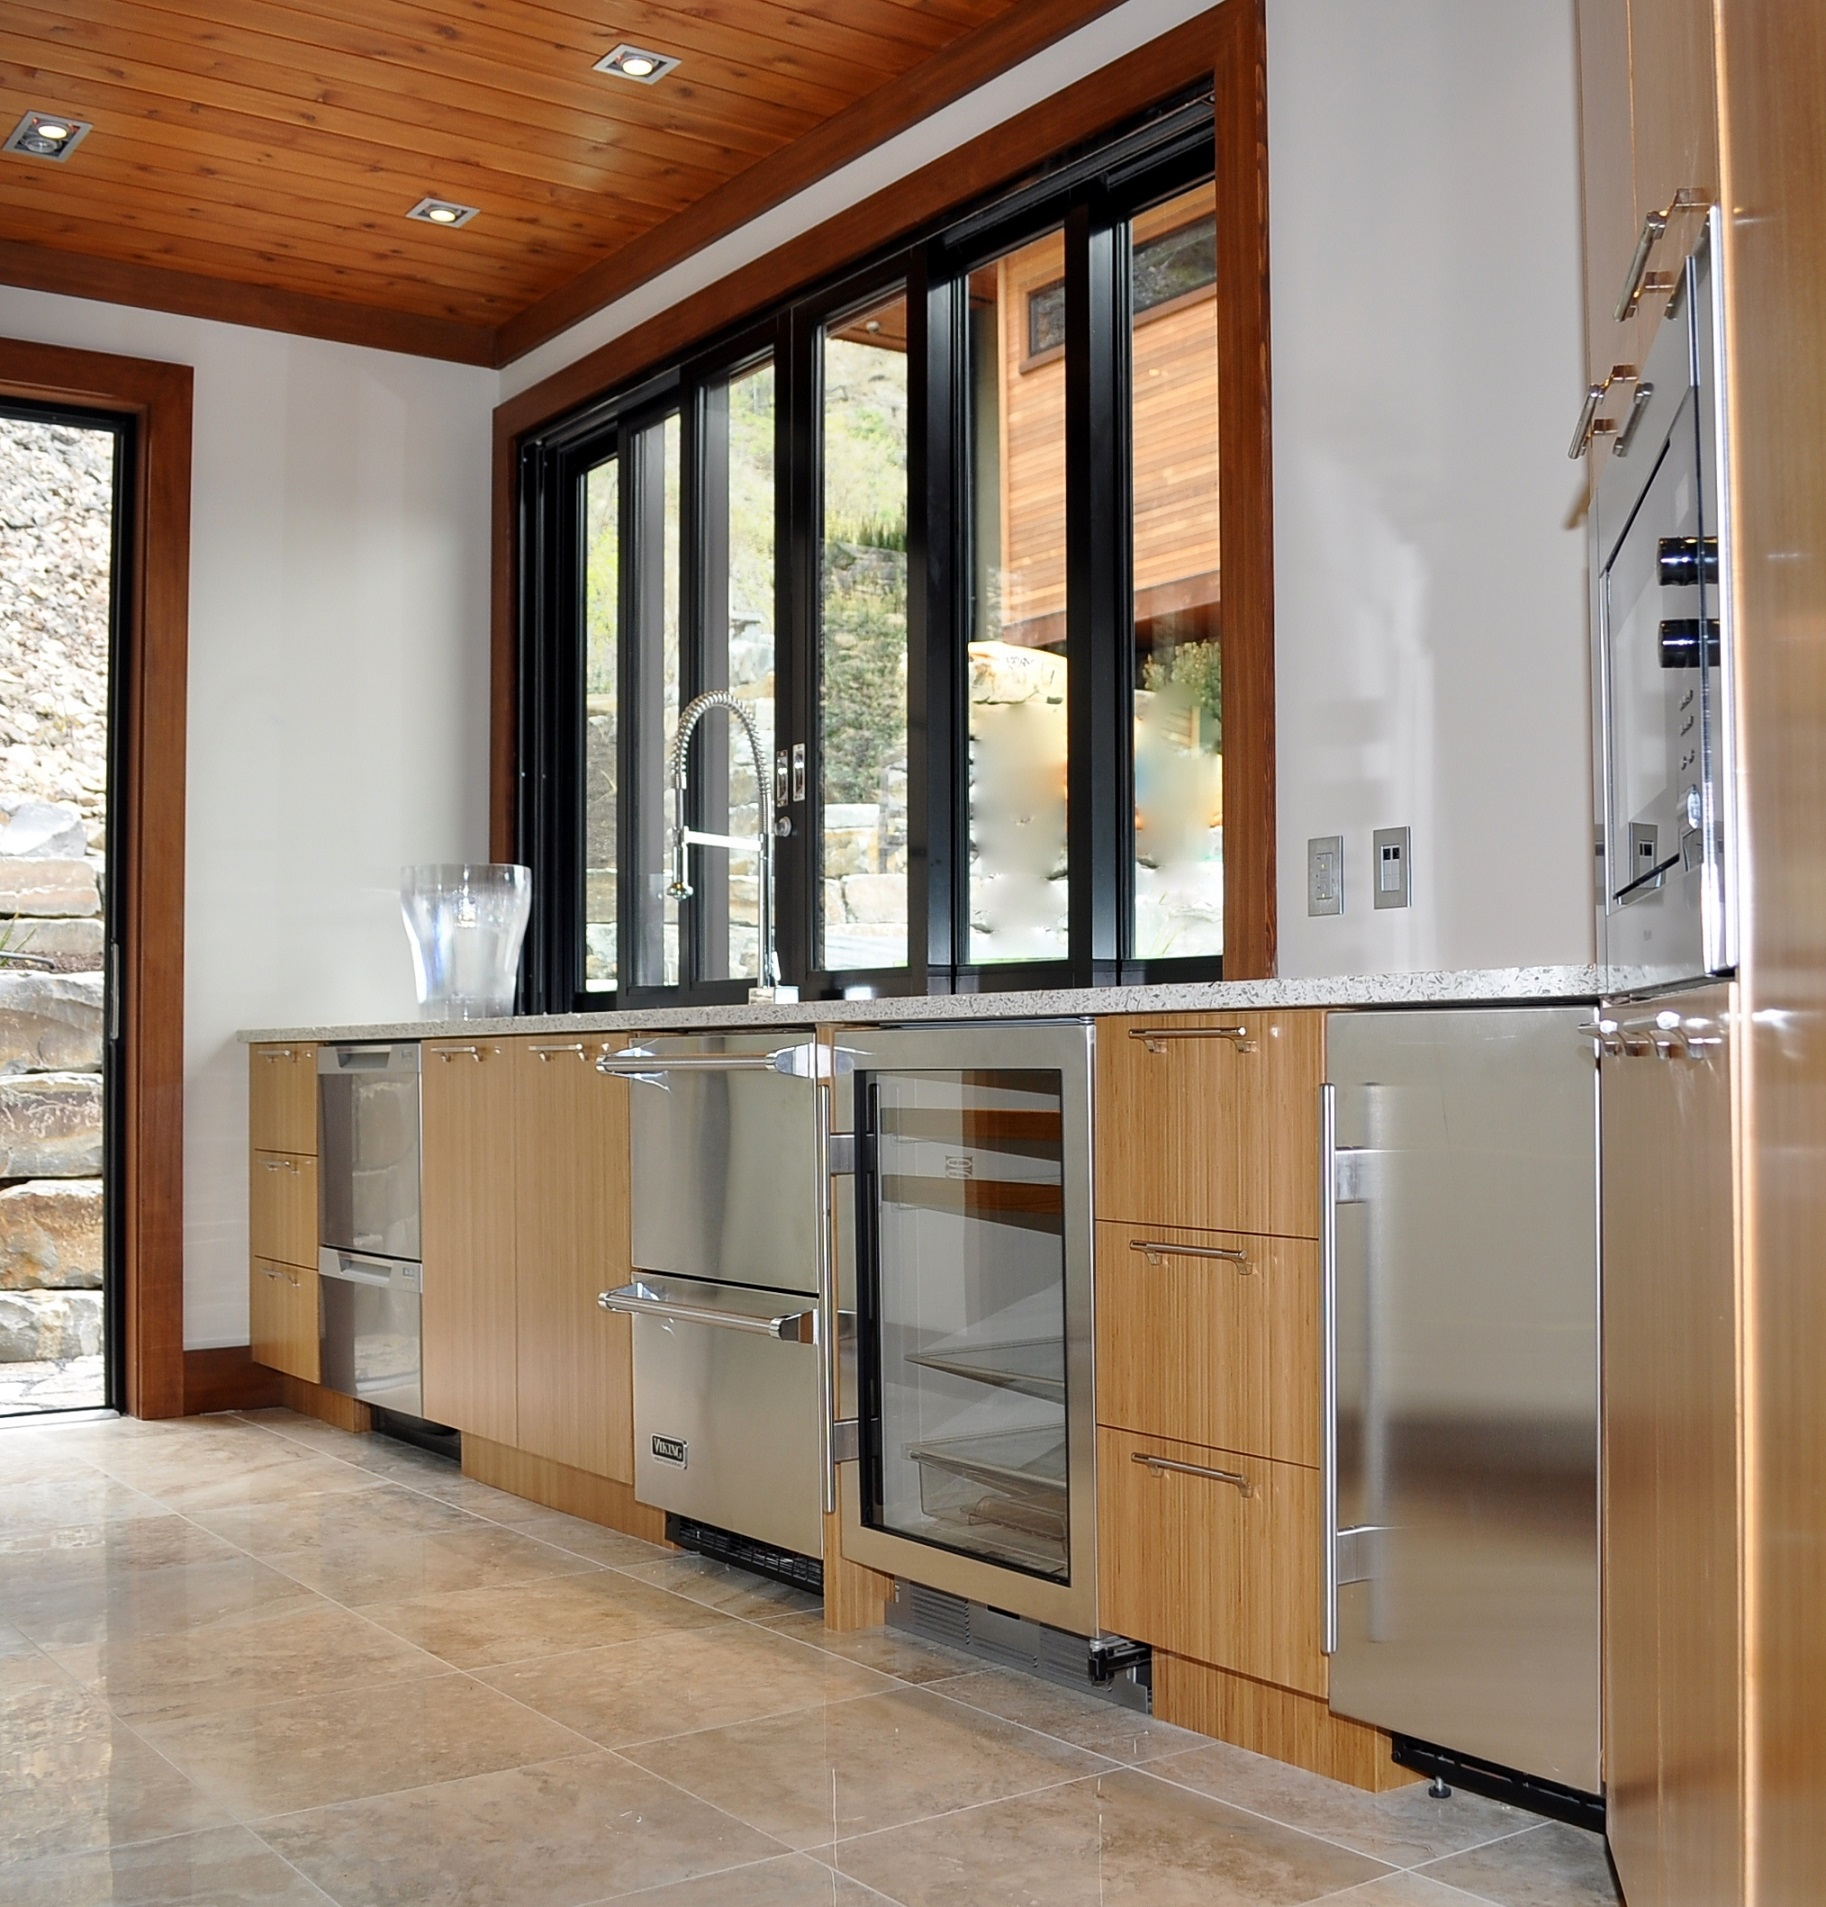 bamboo-wood-bar-kitchen-cabinetry.JPG